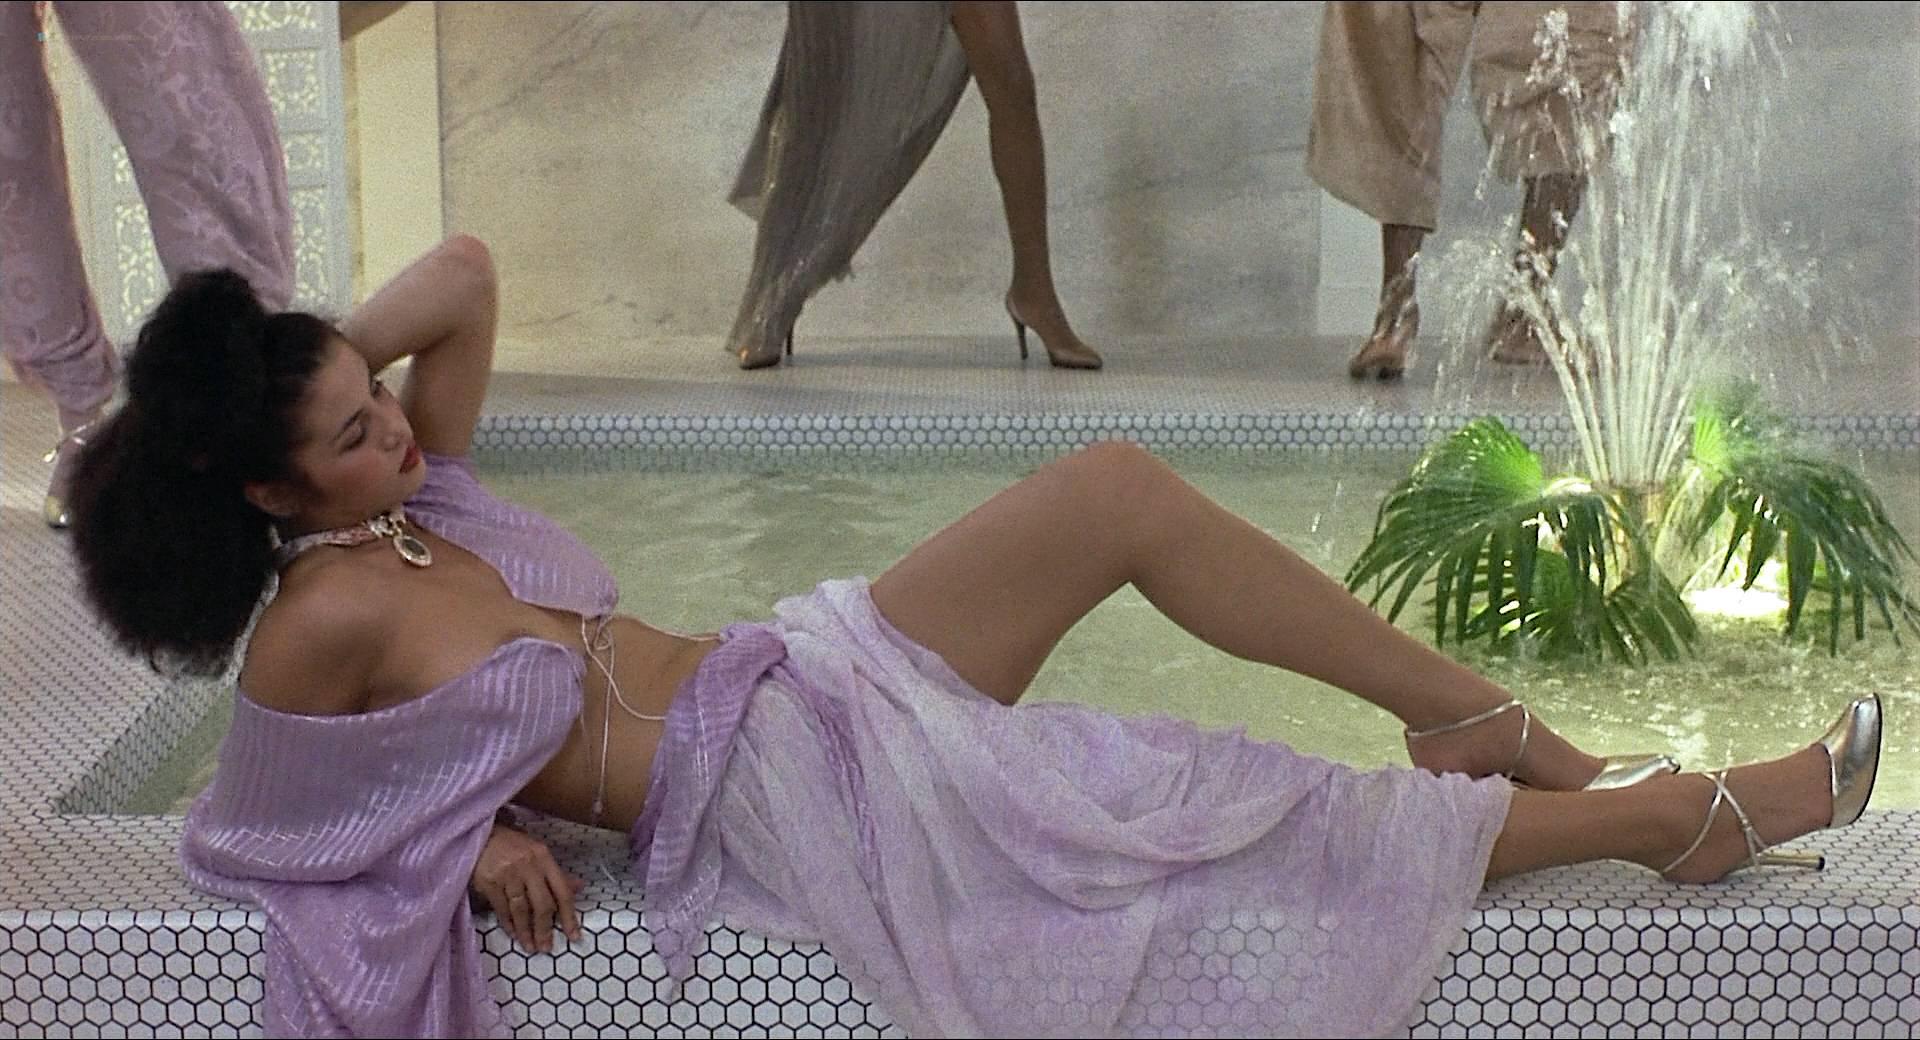 Darlanne Fluegel nude topless Lisa Taylor and Rita Tellone nude topless too - Eyes of Laura Mars (1978) HD 1080p BluRay (5)